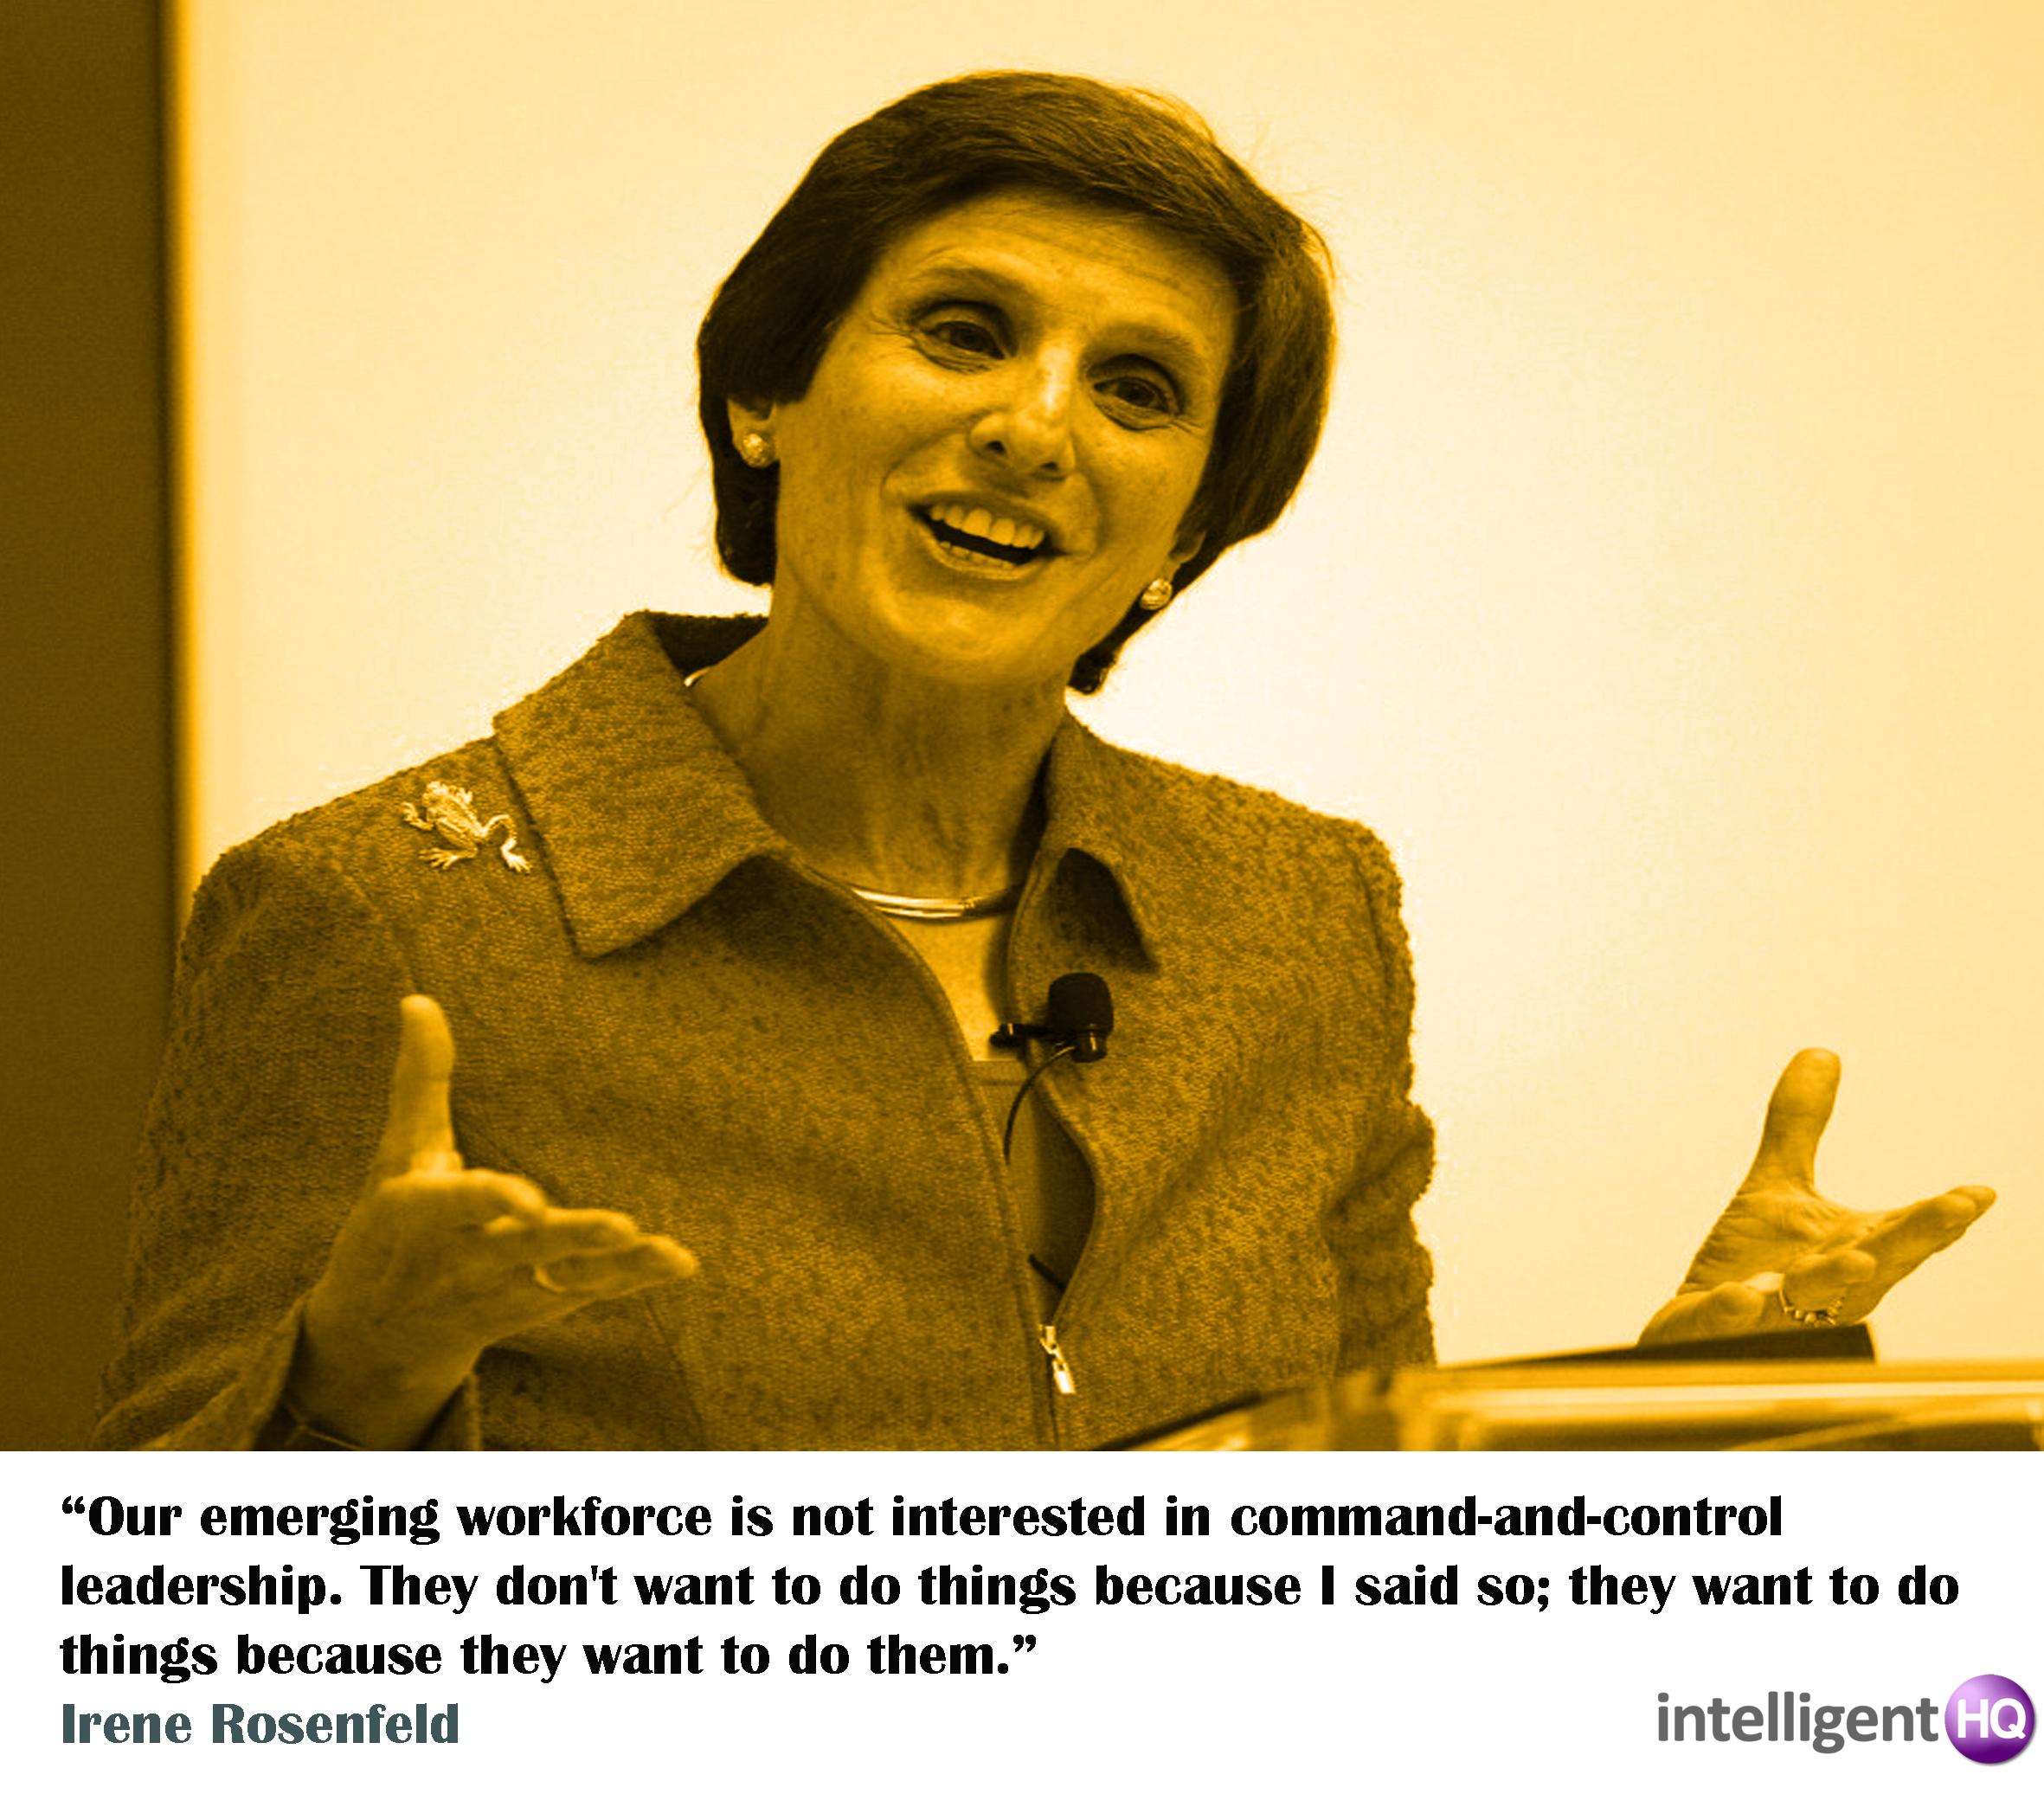 Quote By Irene Rosenfeld. Intelligenthq